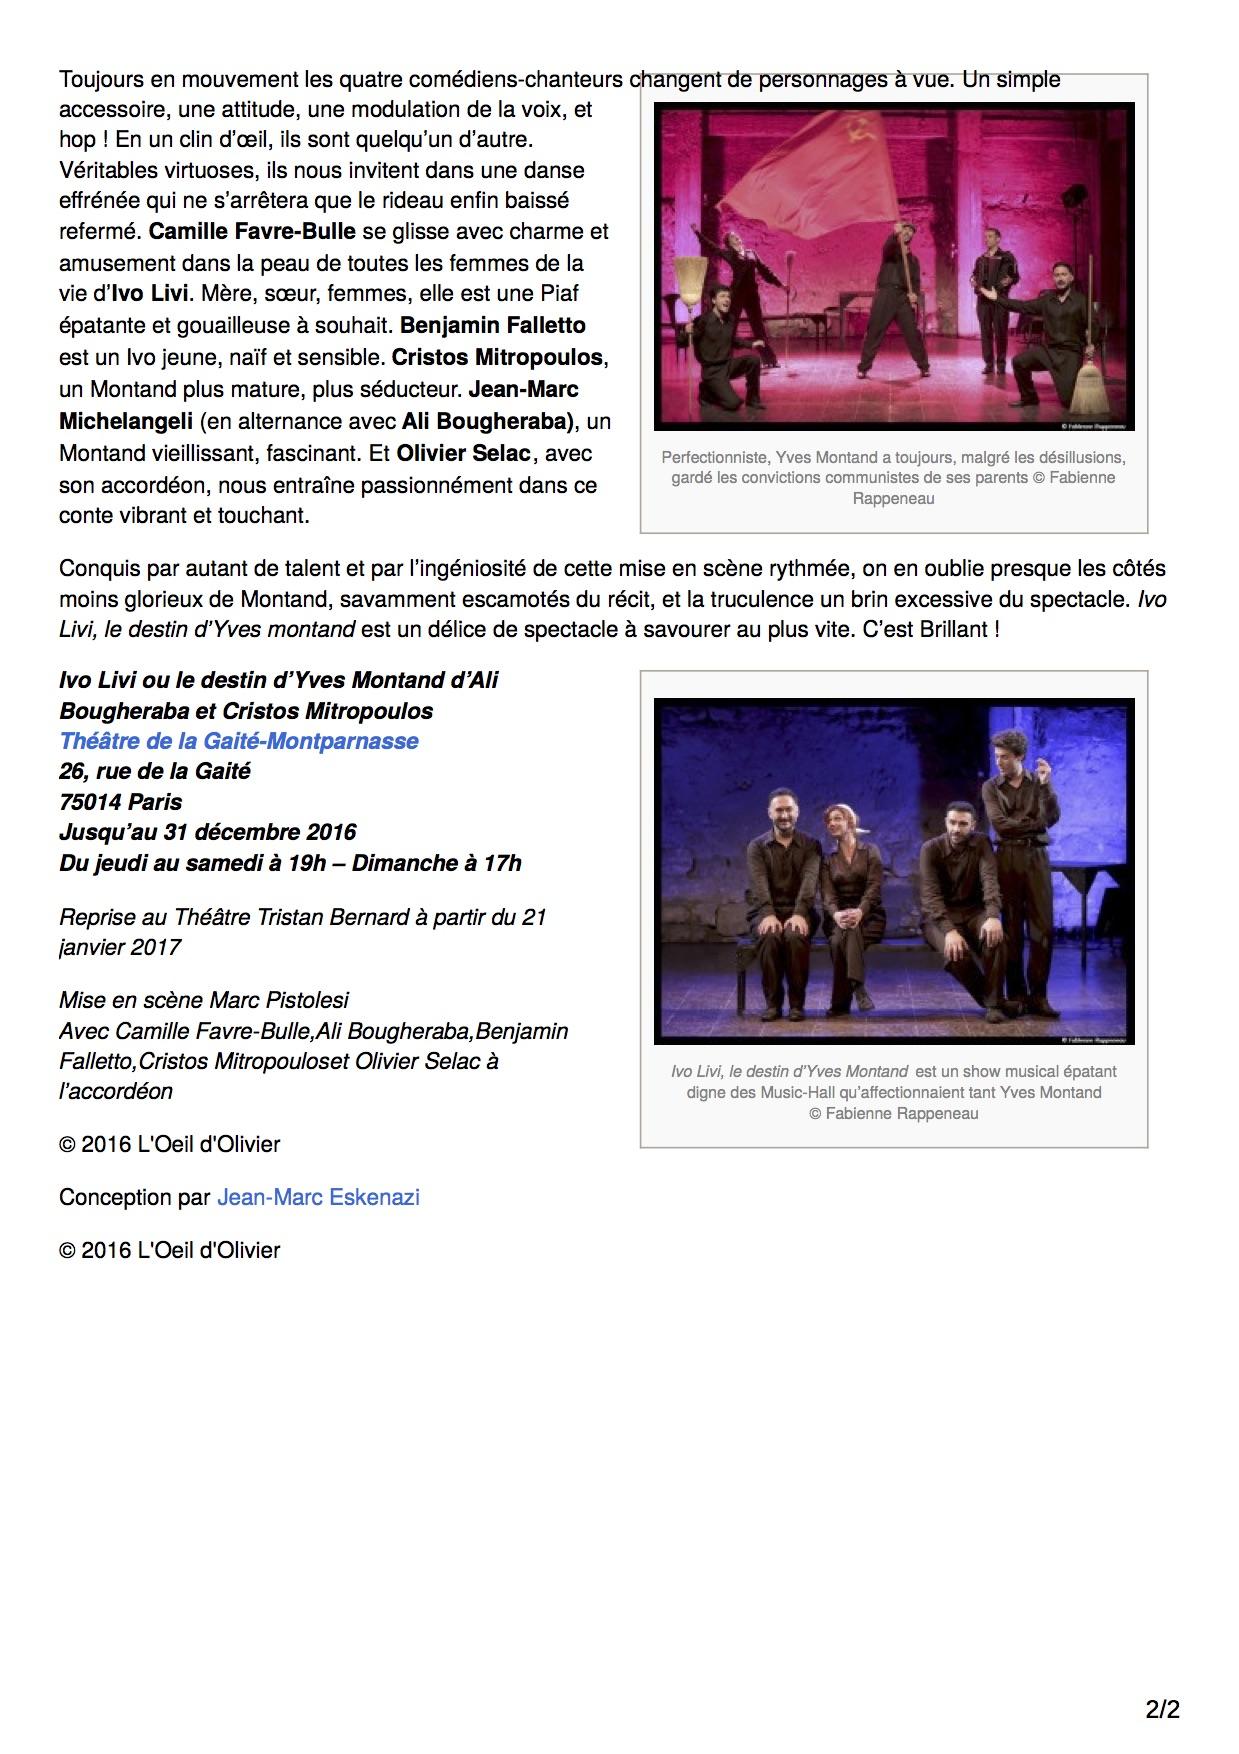 loeildolivier.fr p2-18.12.16